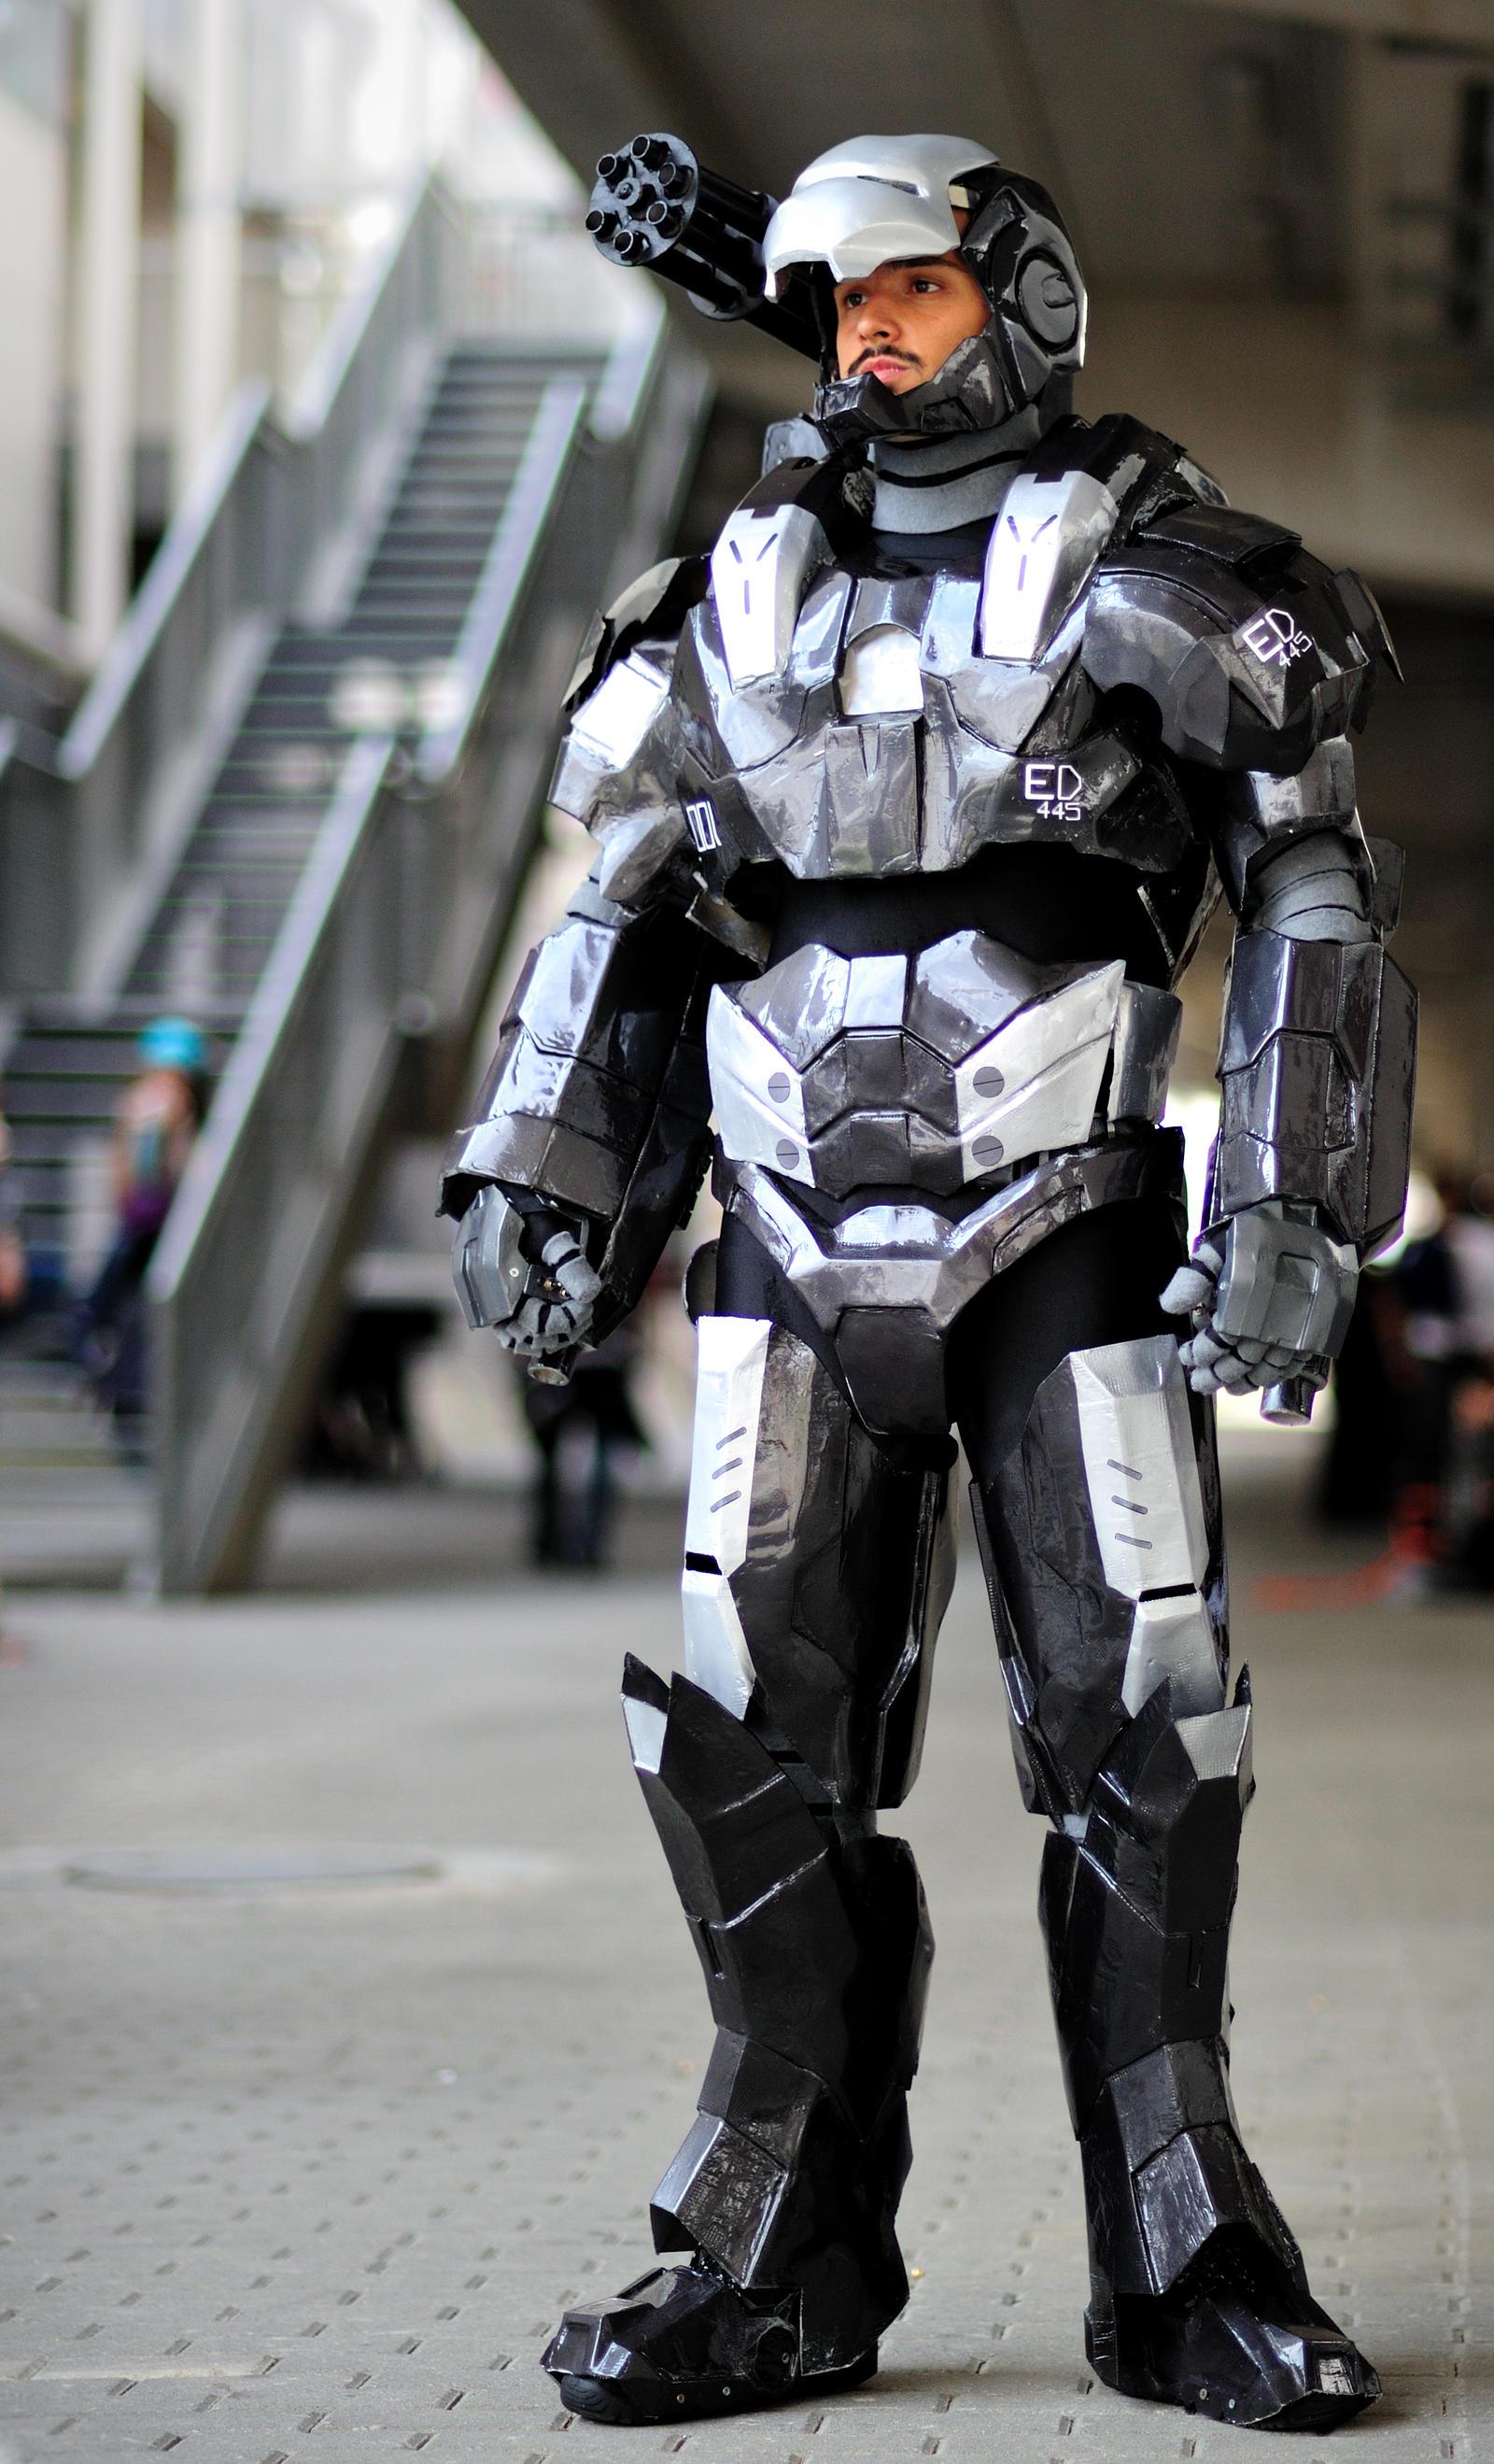 Warmachine cosplay 2